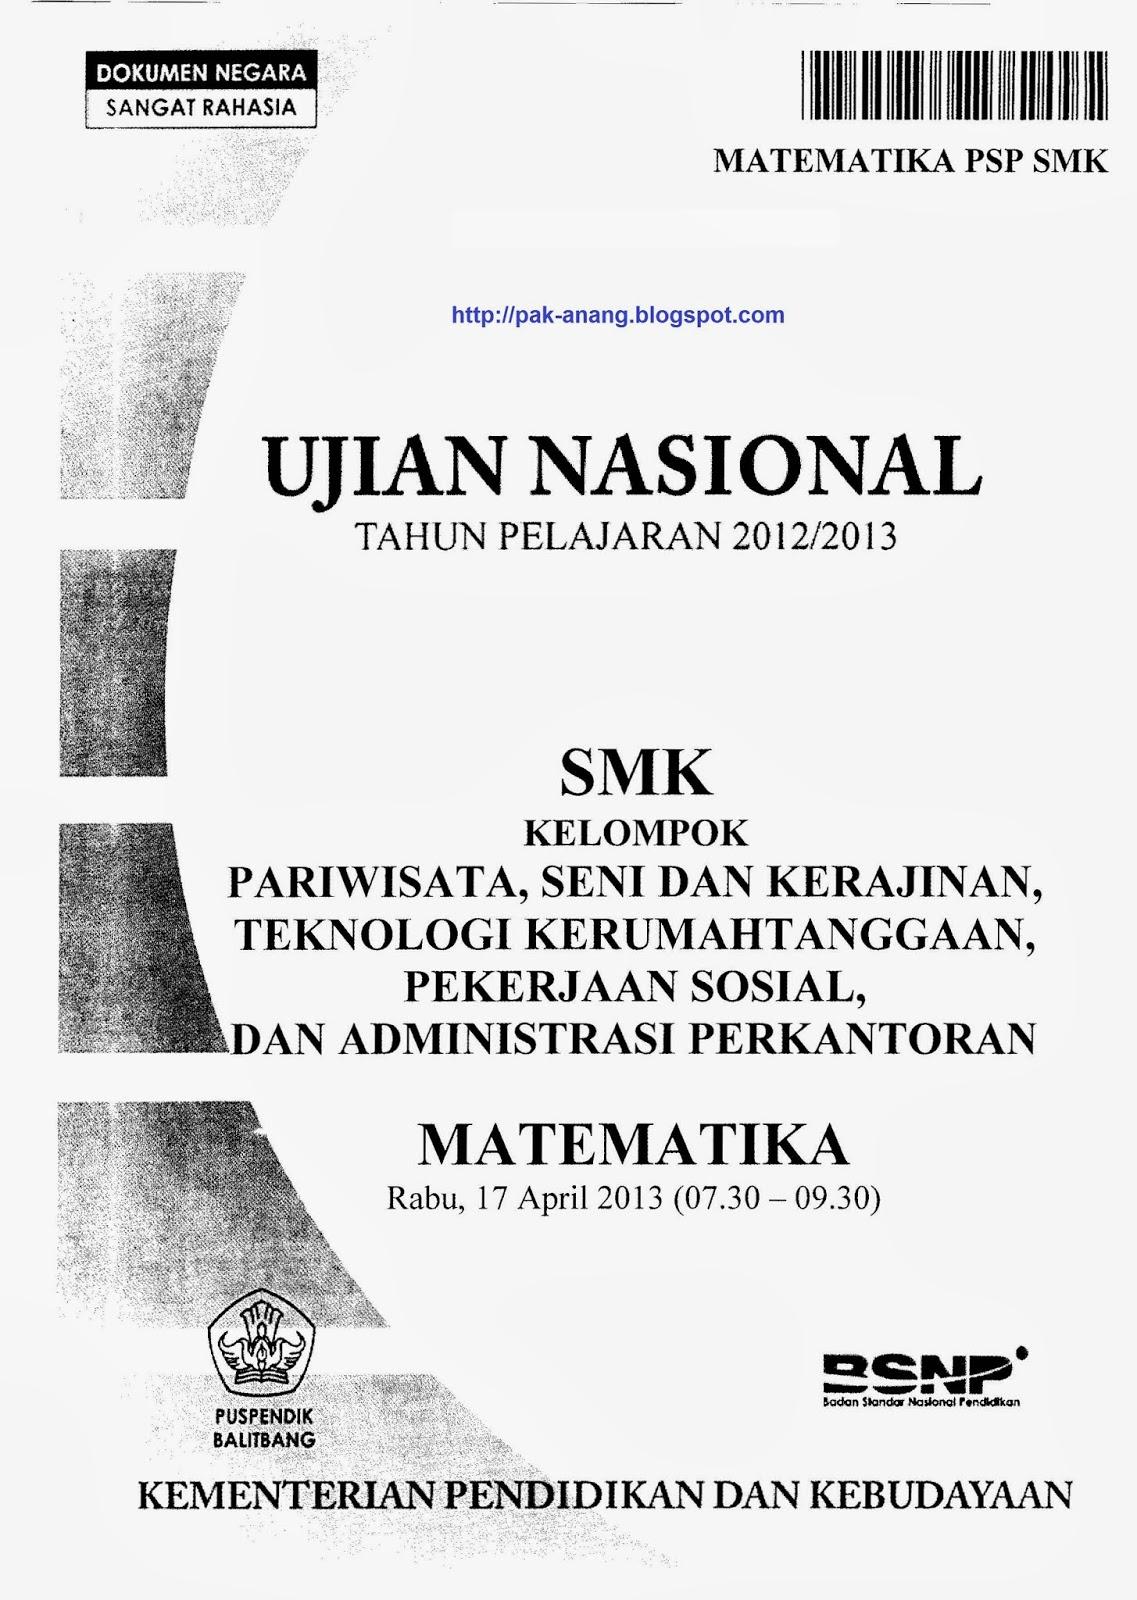 Laporan Prakerin Bahasa Inggris Laporan Praktik Kerja Industri Prakerin Tahun 2011 Download Soal Un Matematika Smp 2011